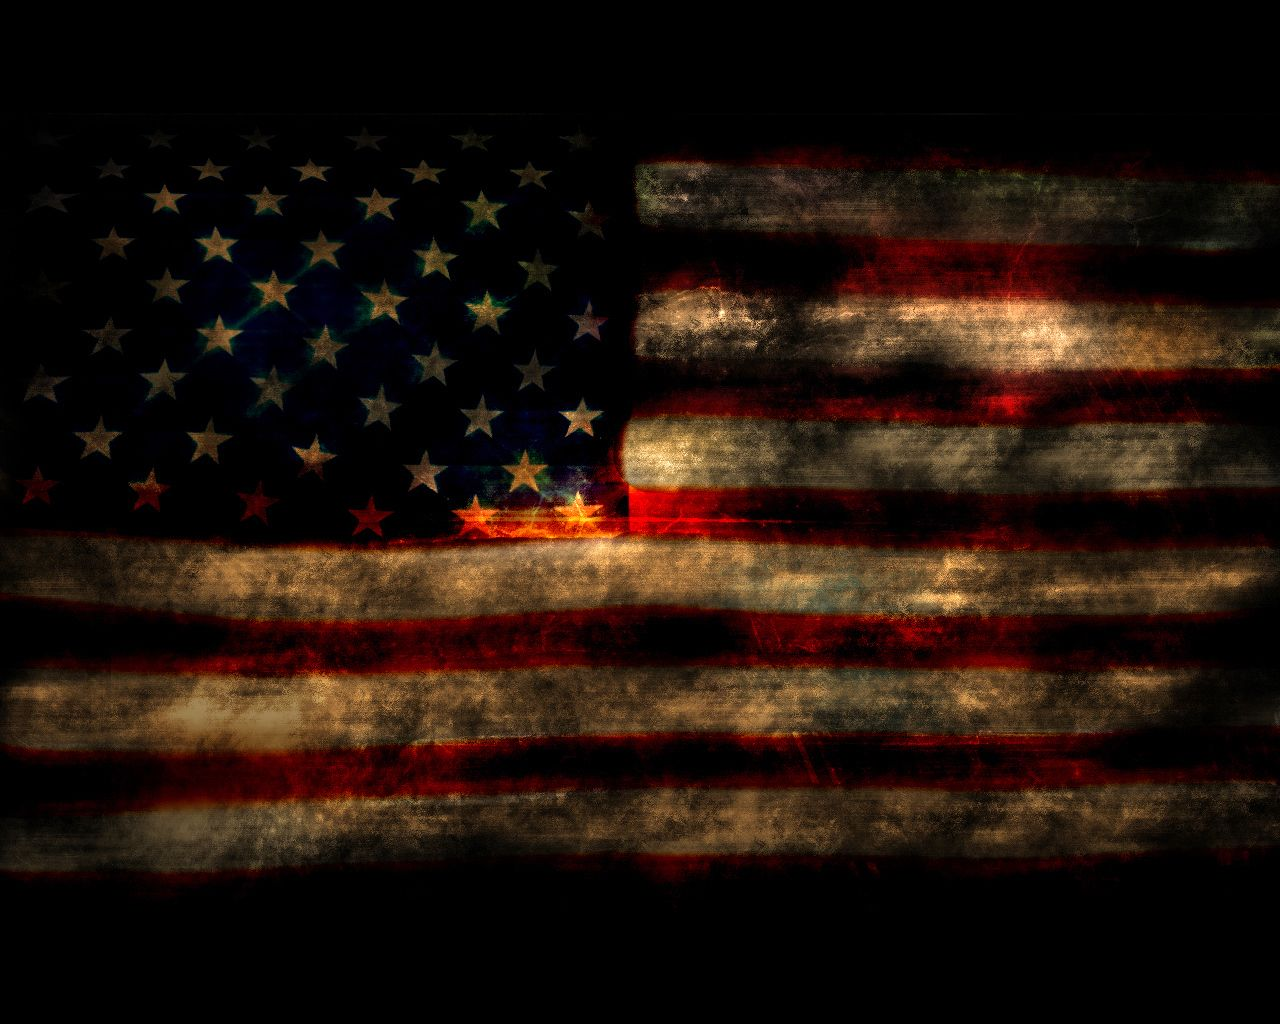 Hd wallpaper usa flag - Merletto Natural Wallpaper Belgravia Wallpaper Lancashire Old American Flagamerican